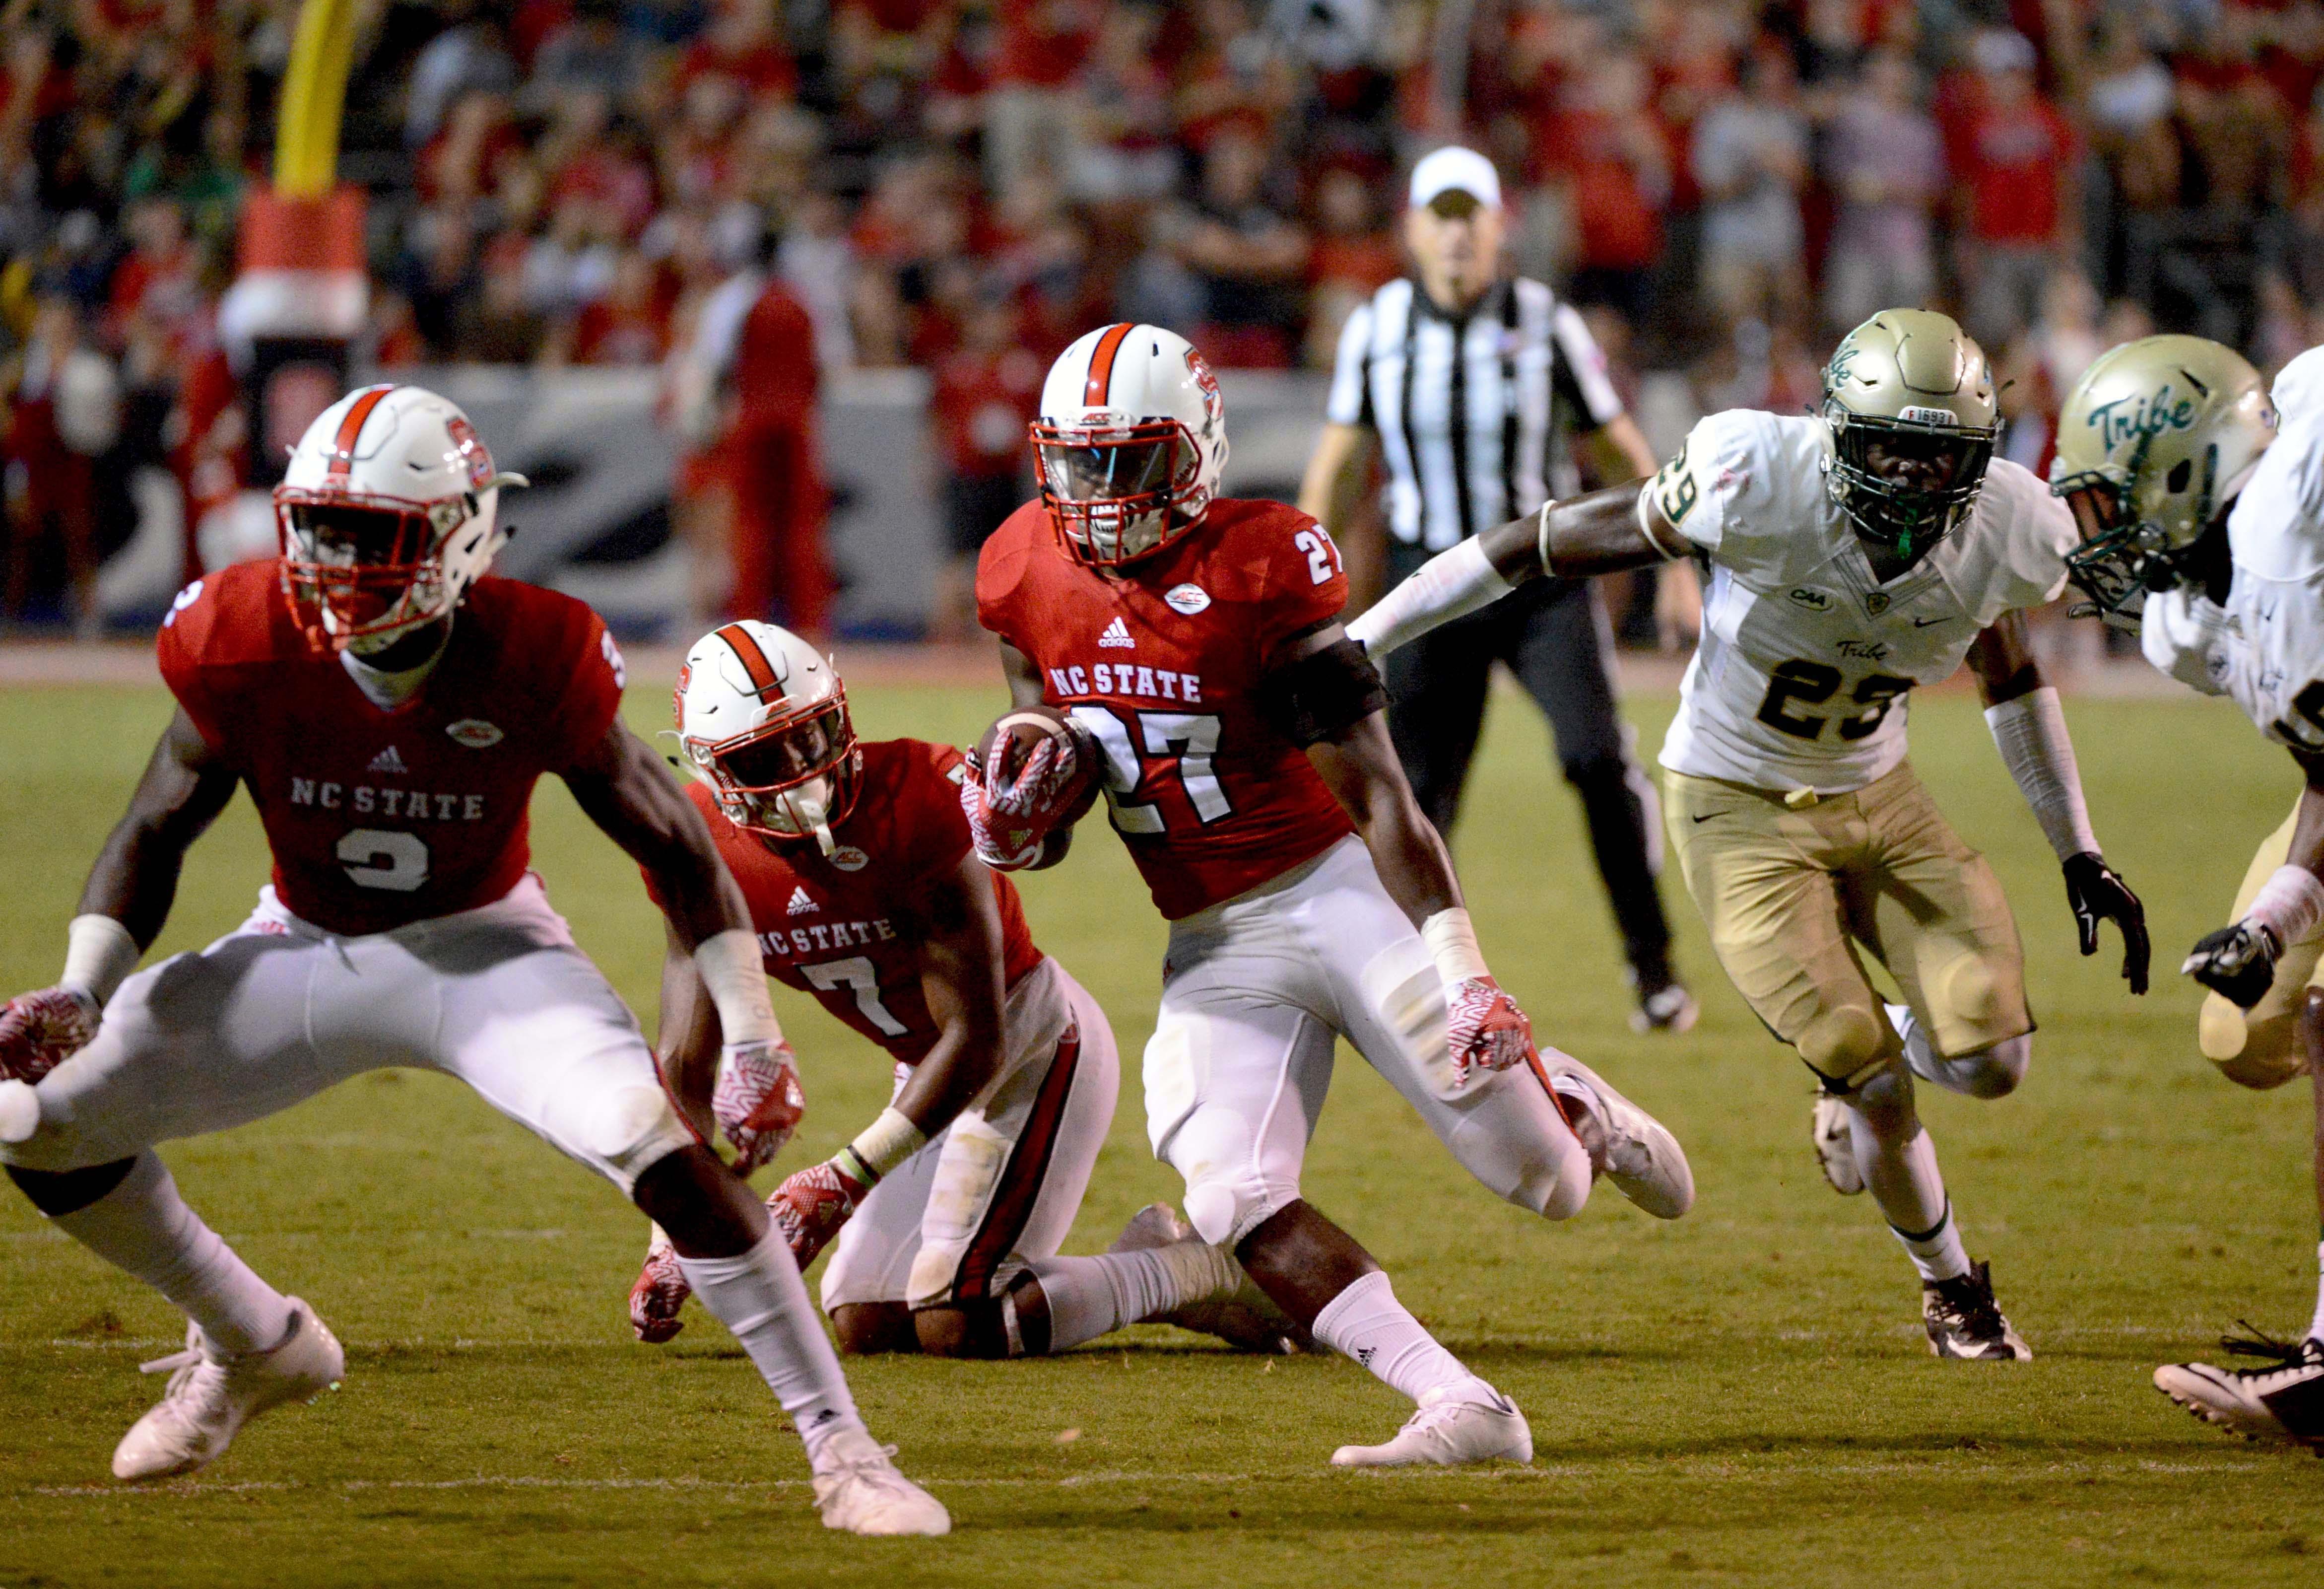 NCAA Football: William & Mary at North Carolina State